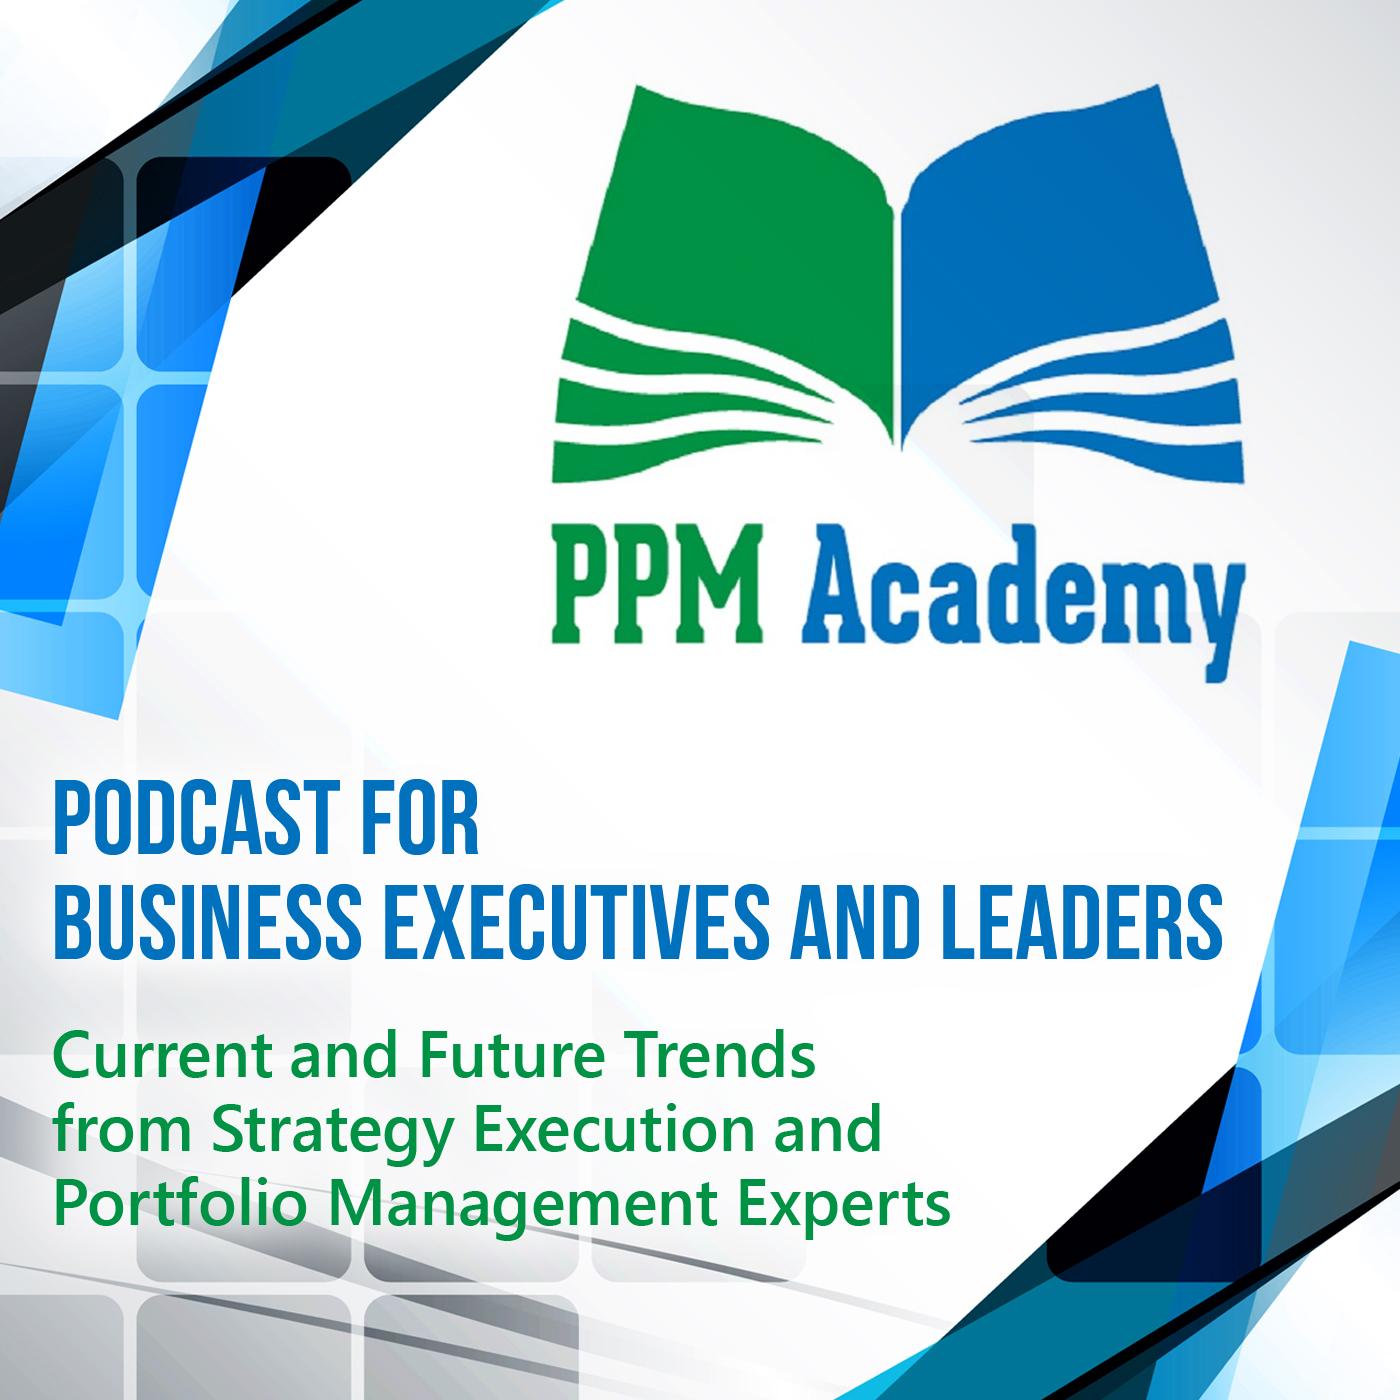 PPM Academy